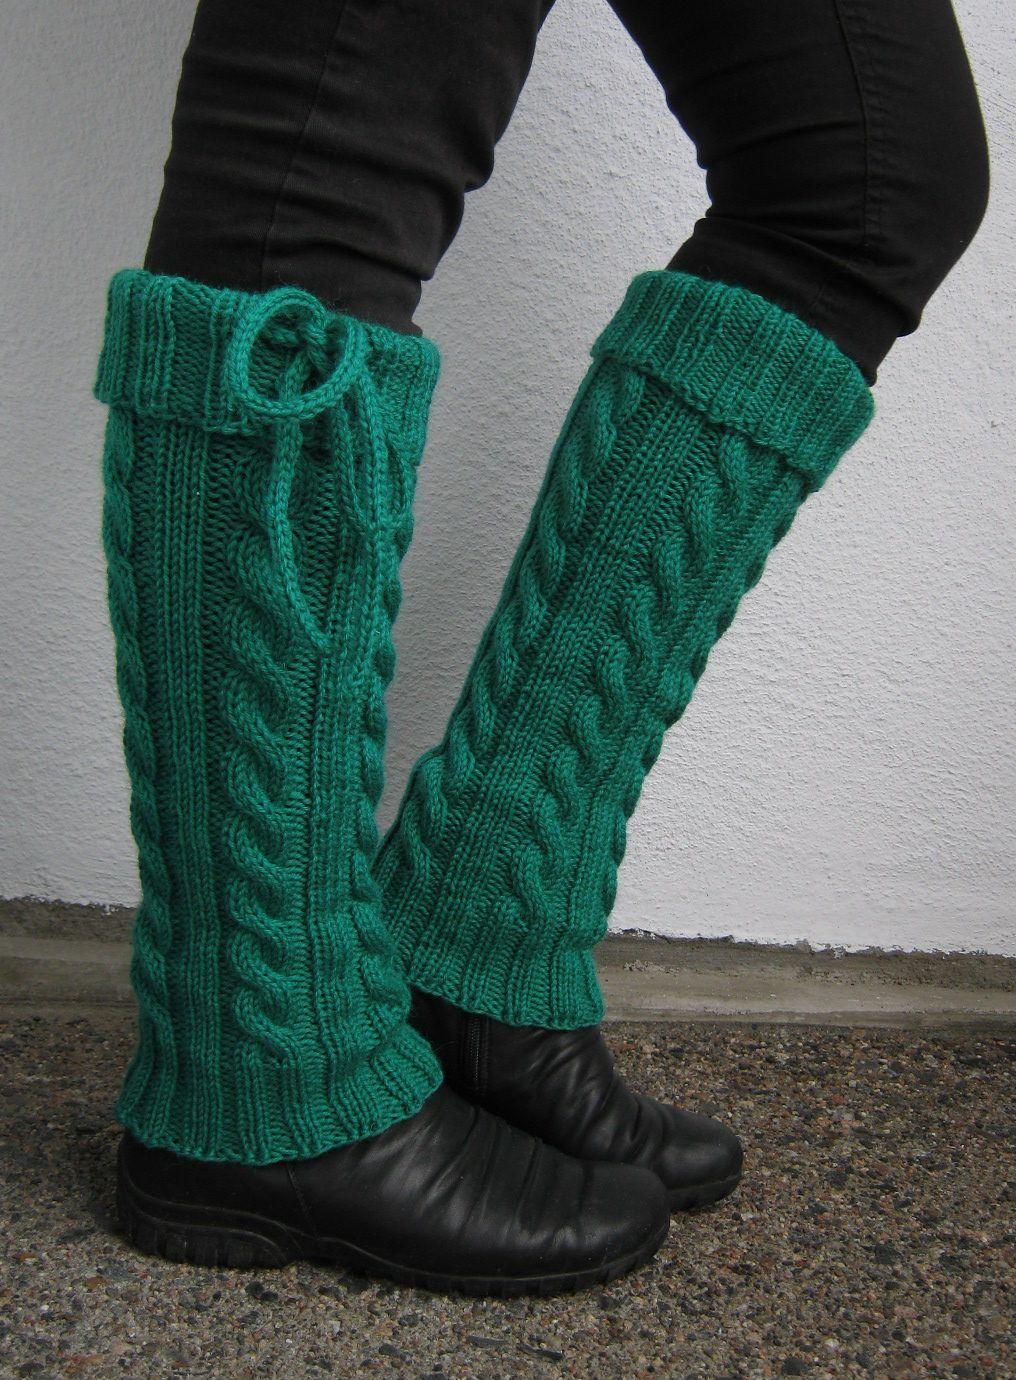 Legwarmer Knitting Patterns | Knitting patterns, Patterns and Free